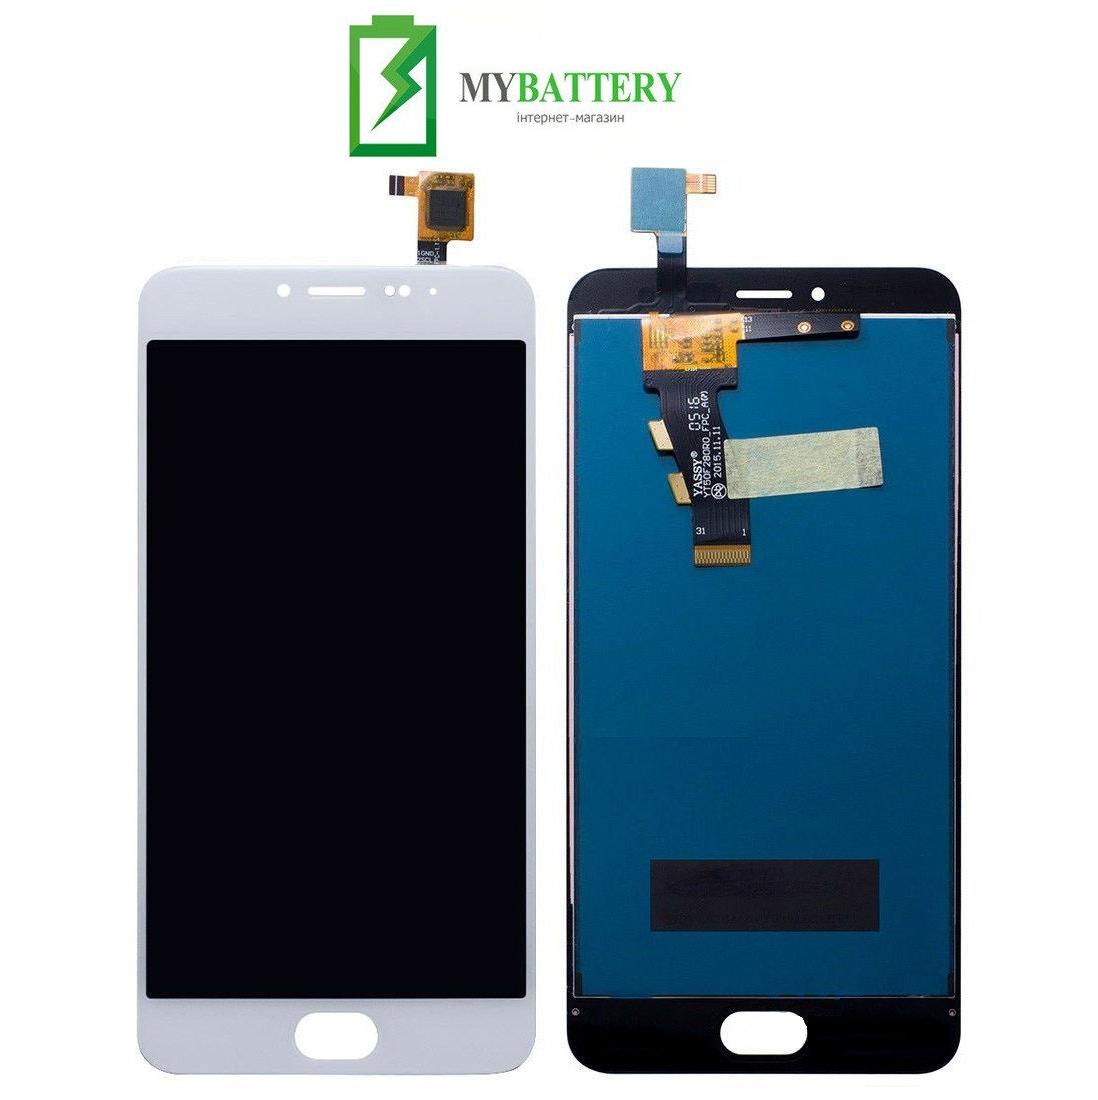 Дисплей (LCD) Meizu M3/M3 mini (M688H) с сенсором белый